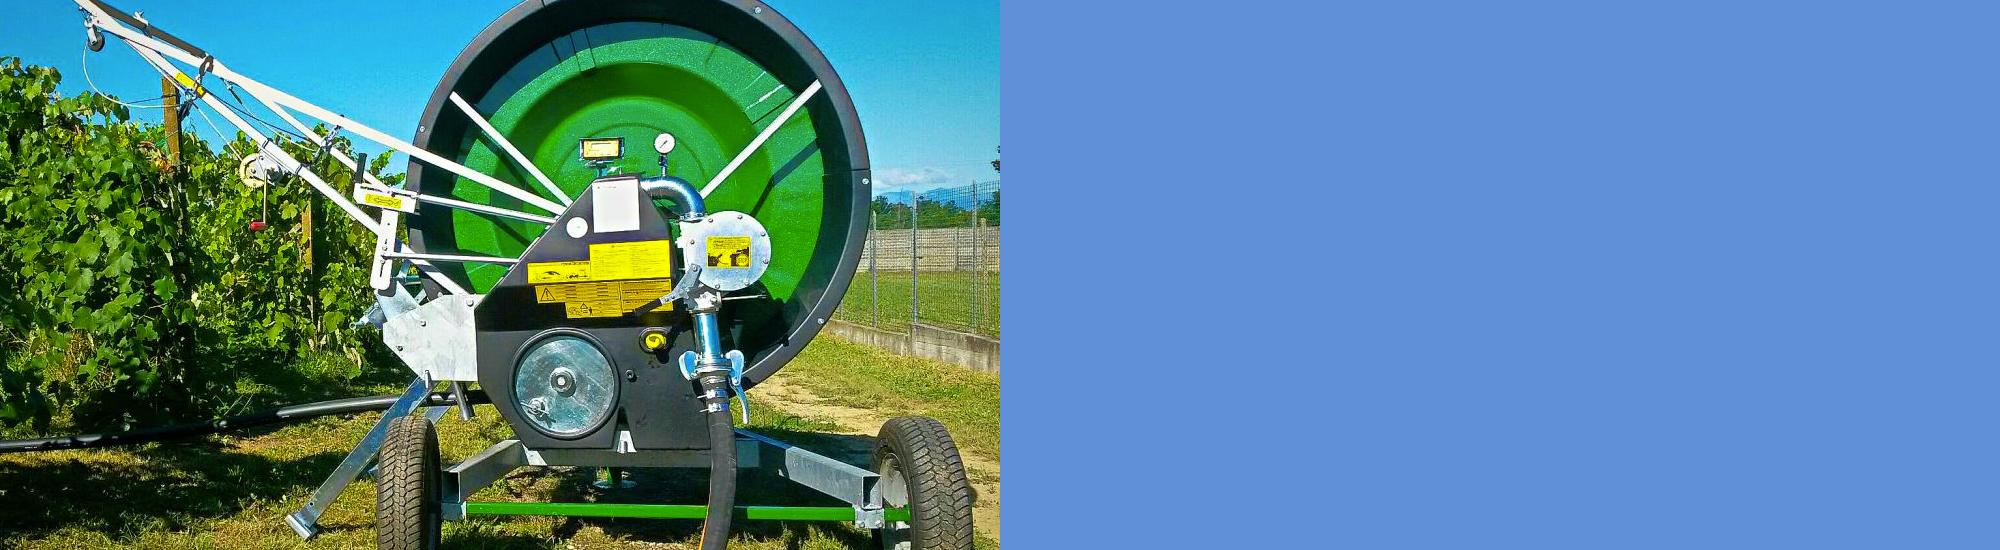 irrigazione-slide